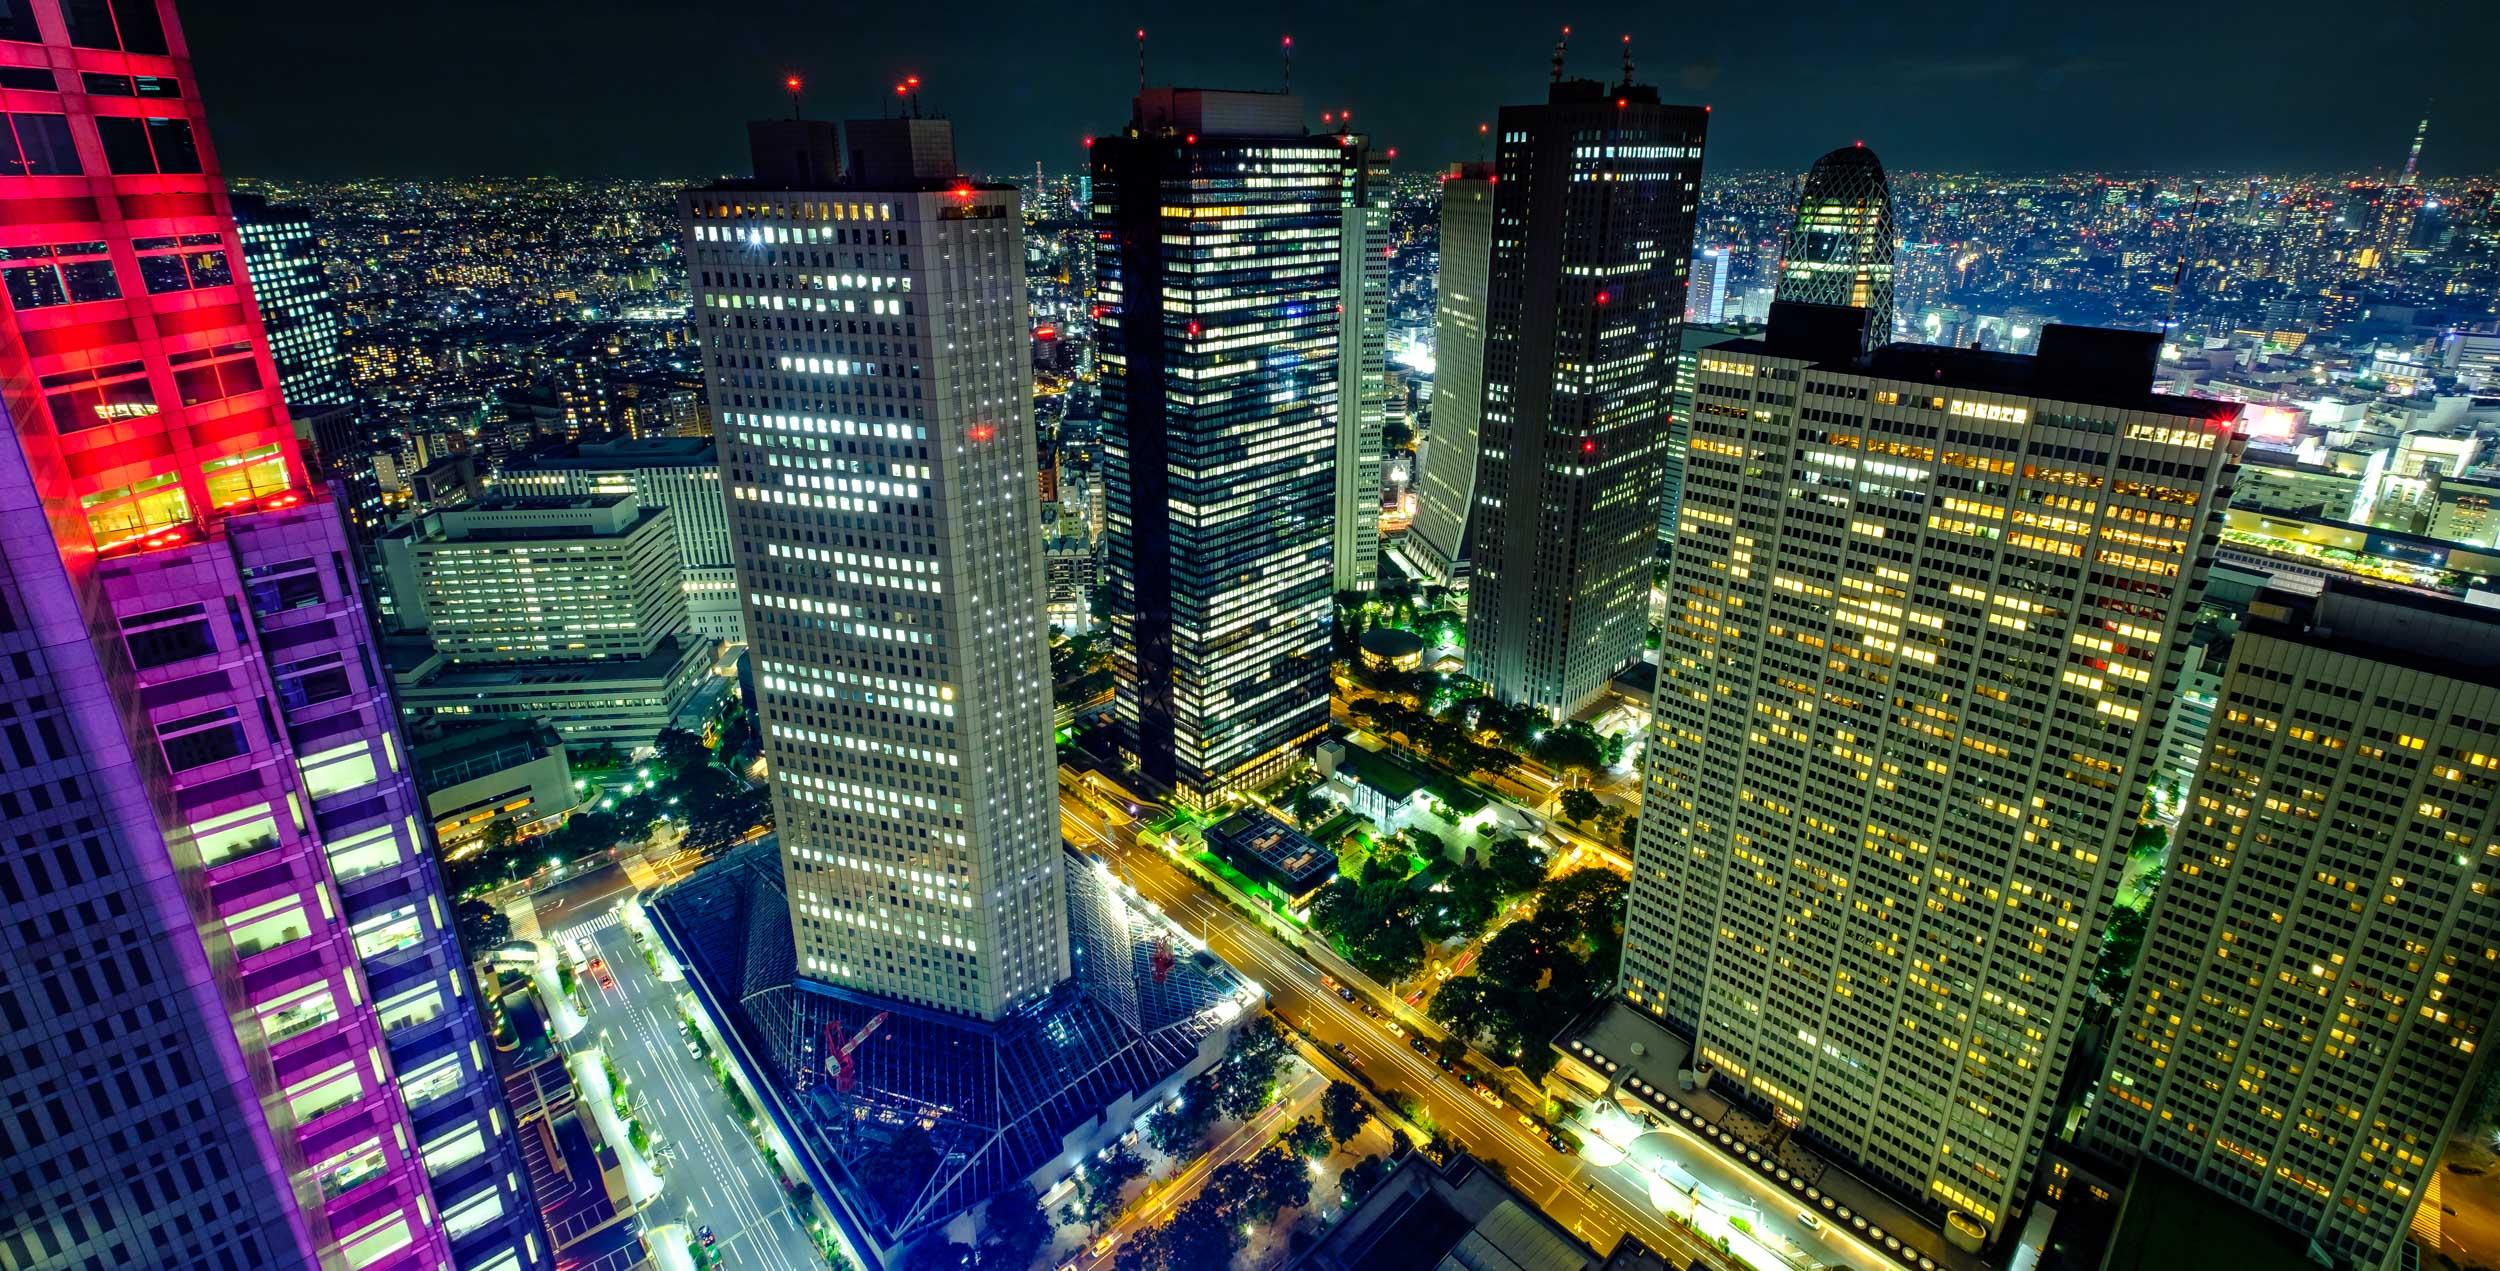 Looking over the skyscrapers of Nishi-Shinjuku